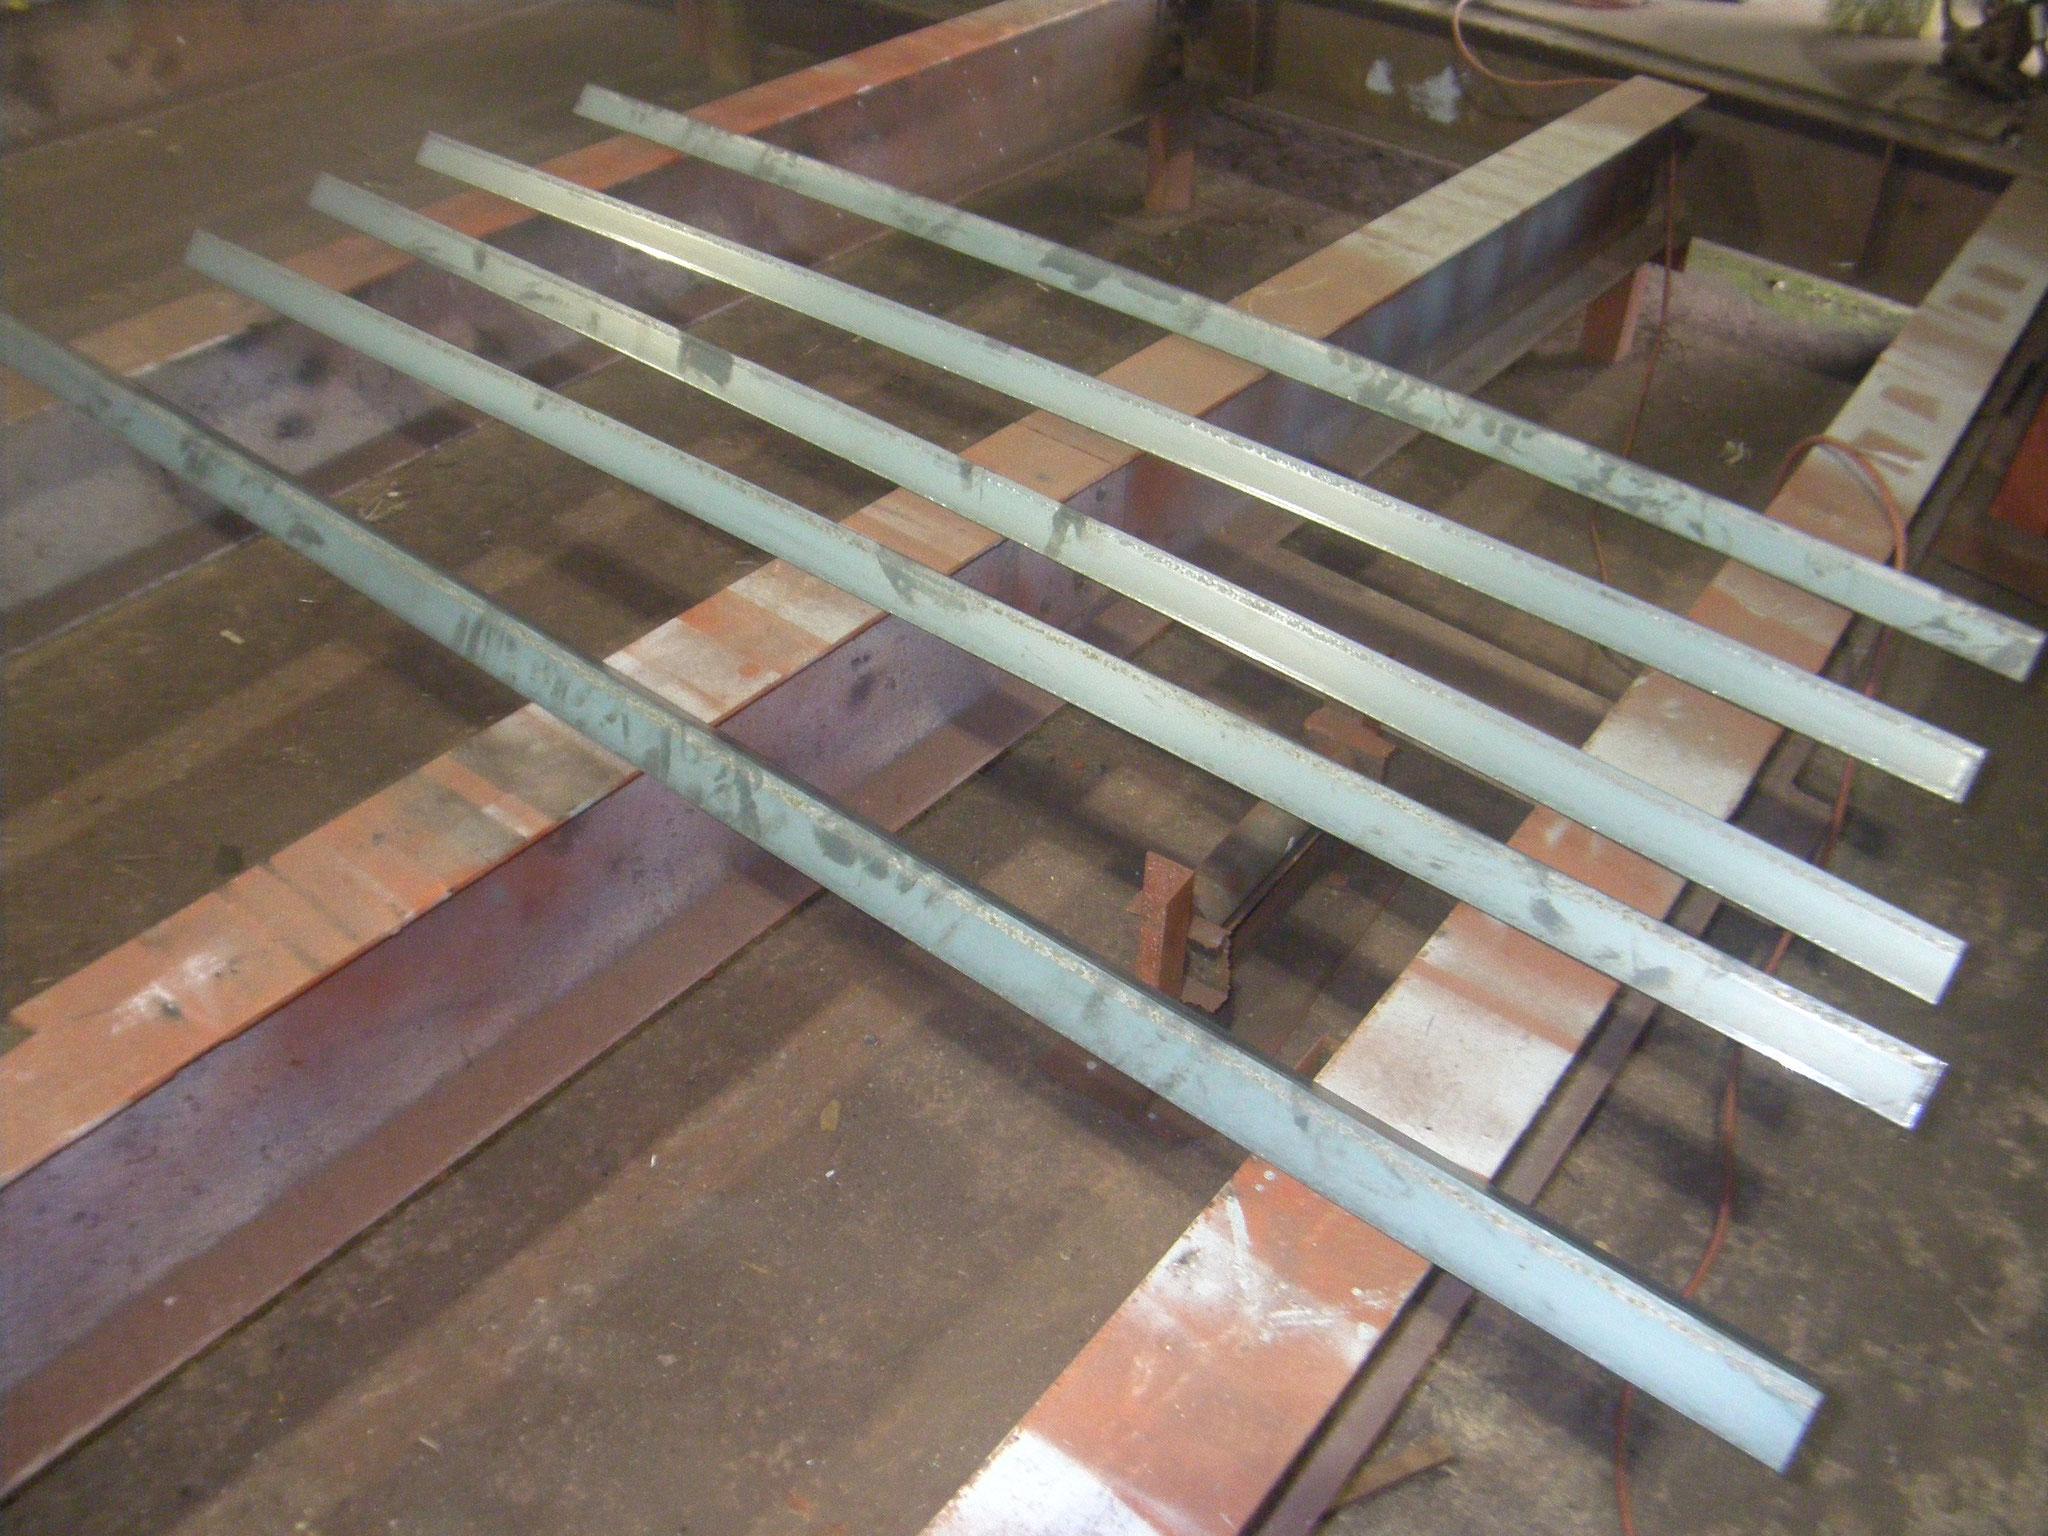 店舗囲い鉄骨補強工事の工程写真